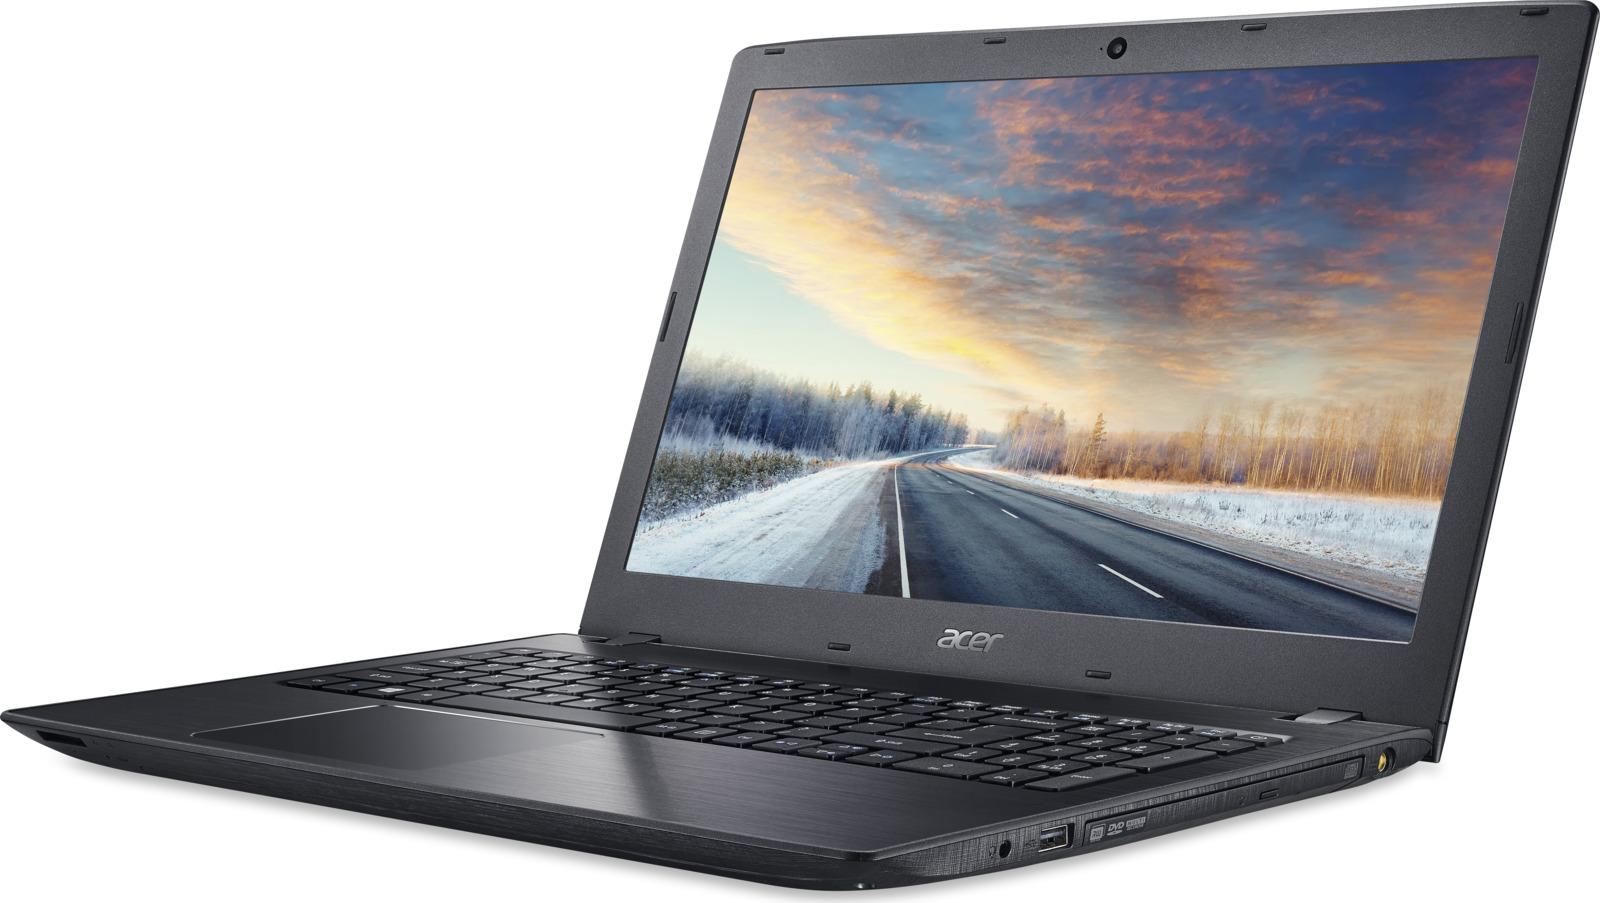 Ноутбук Acer TravelMate TMP259-G2 NX.VEPER.041 ноутбук acer extensa ex2519 p9dq pentium n3710 4gb 500gb dvd rw intel hd graphics 405 15 6 hd 1366x768 linux black wifi bt cam 3500mah